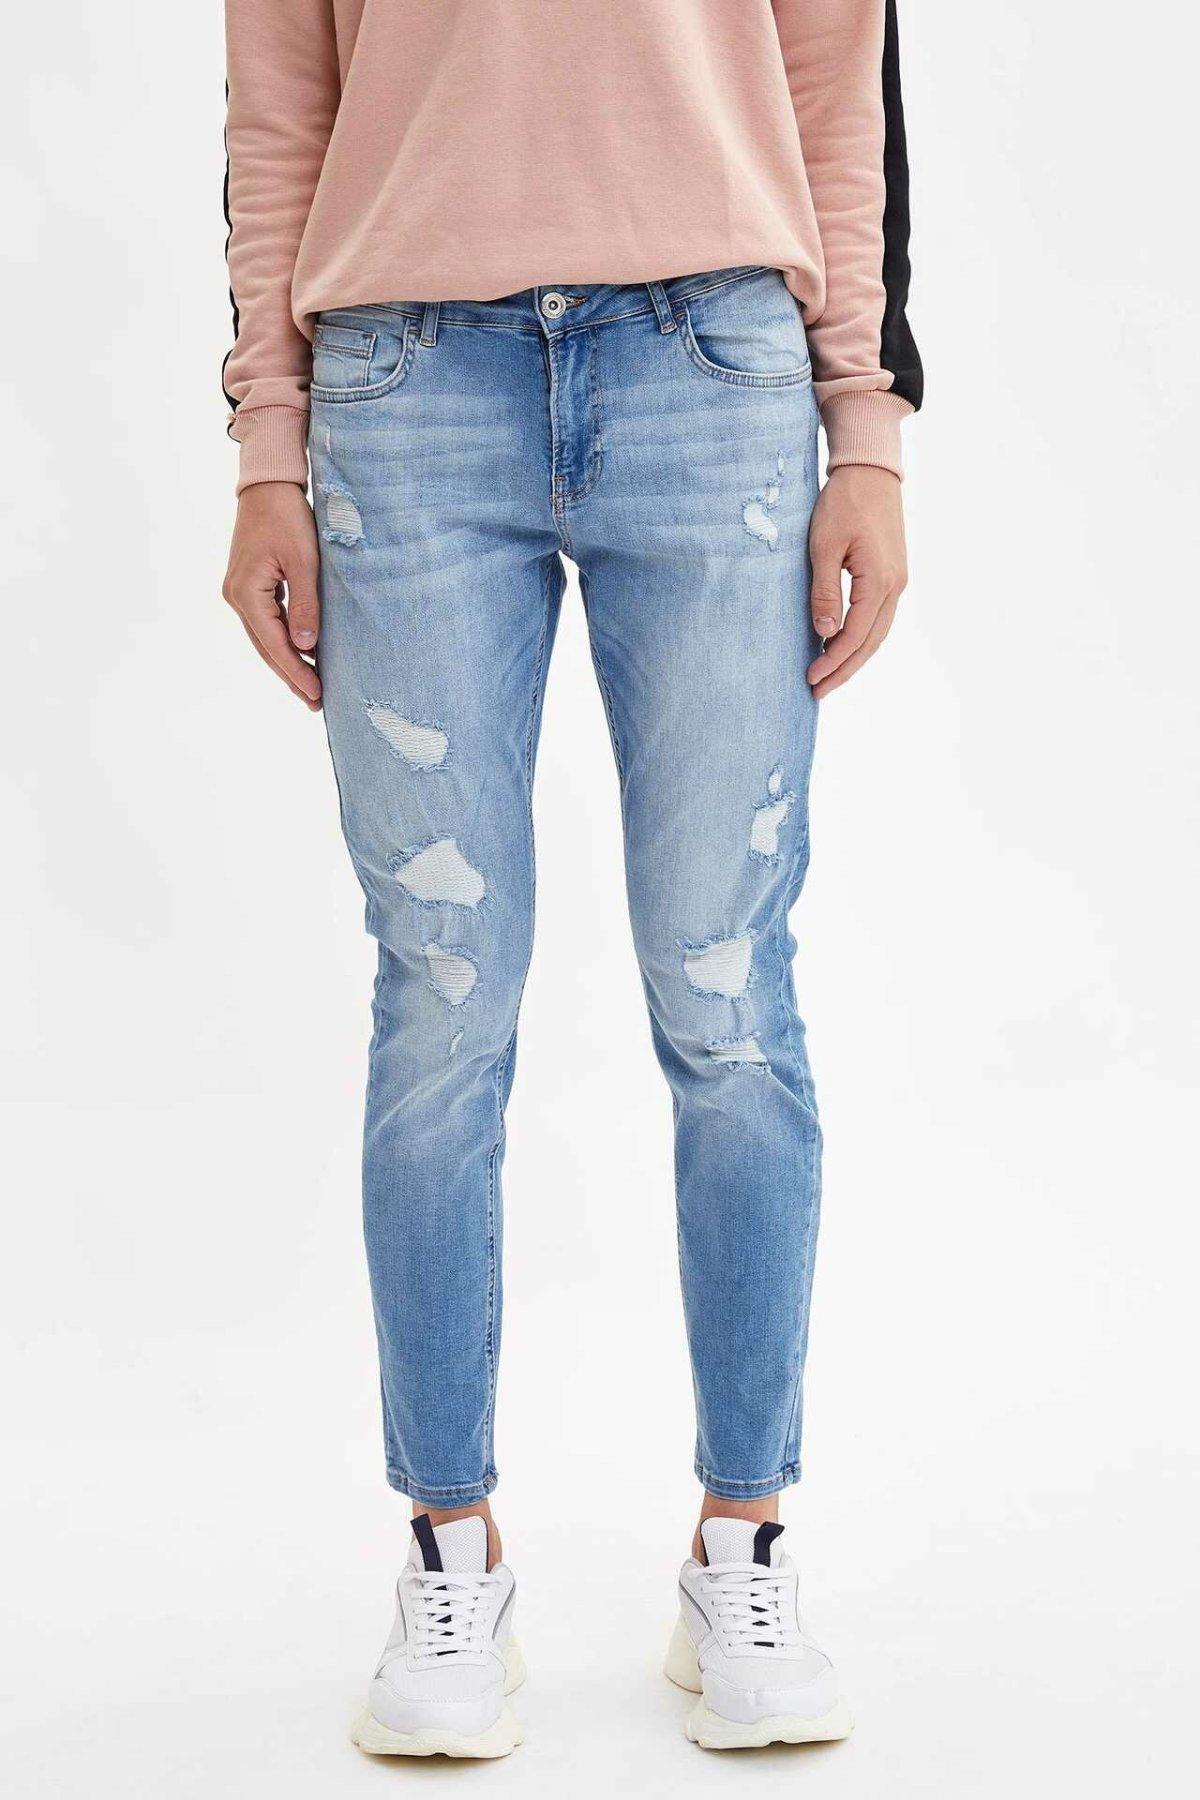 DeFacto Fashion Man Trousers High Quality Male Casual Worn Style Denim Long Pants Simple - L6687AZ19AU